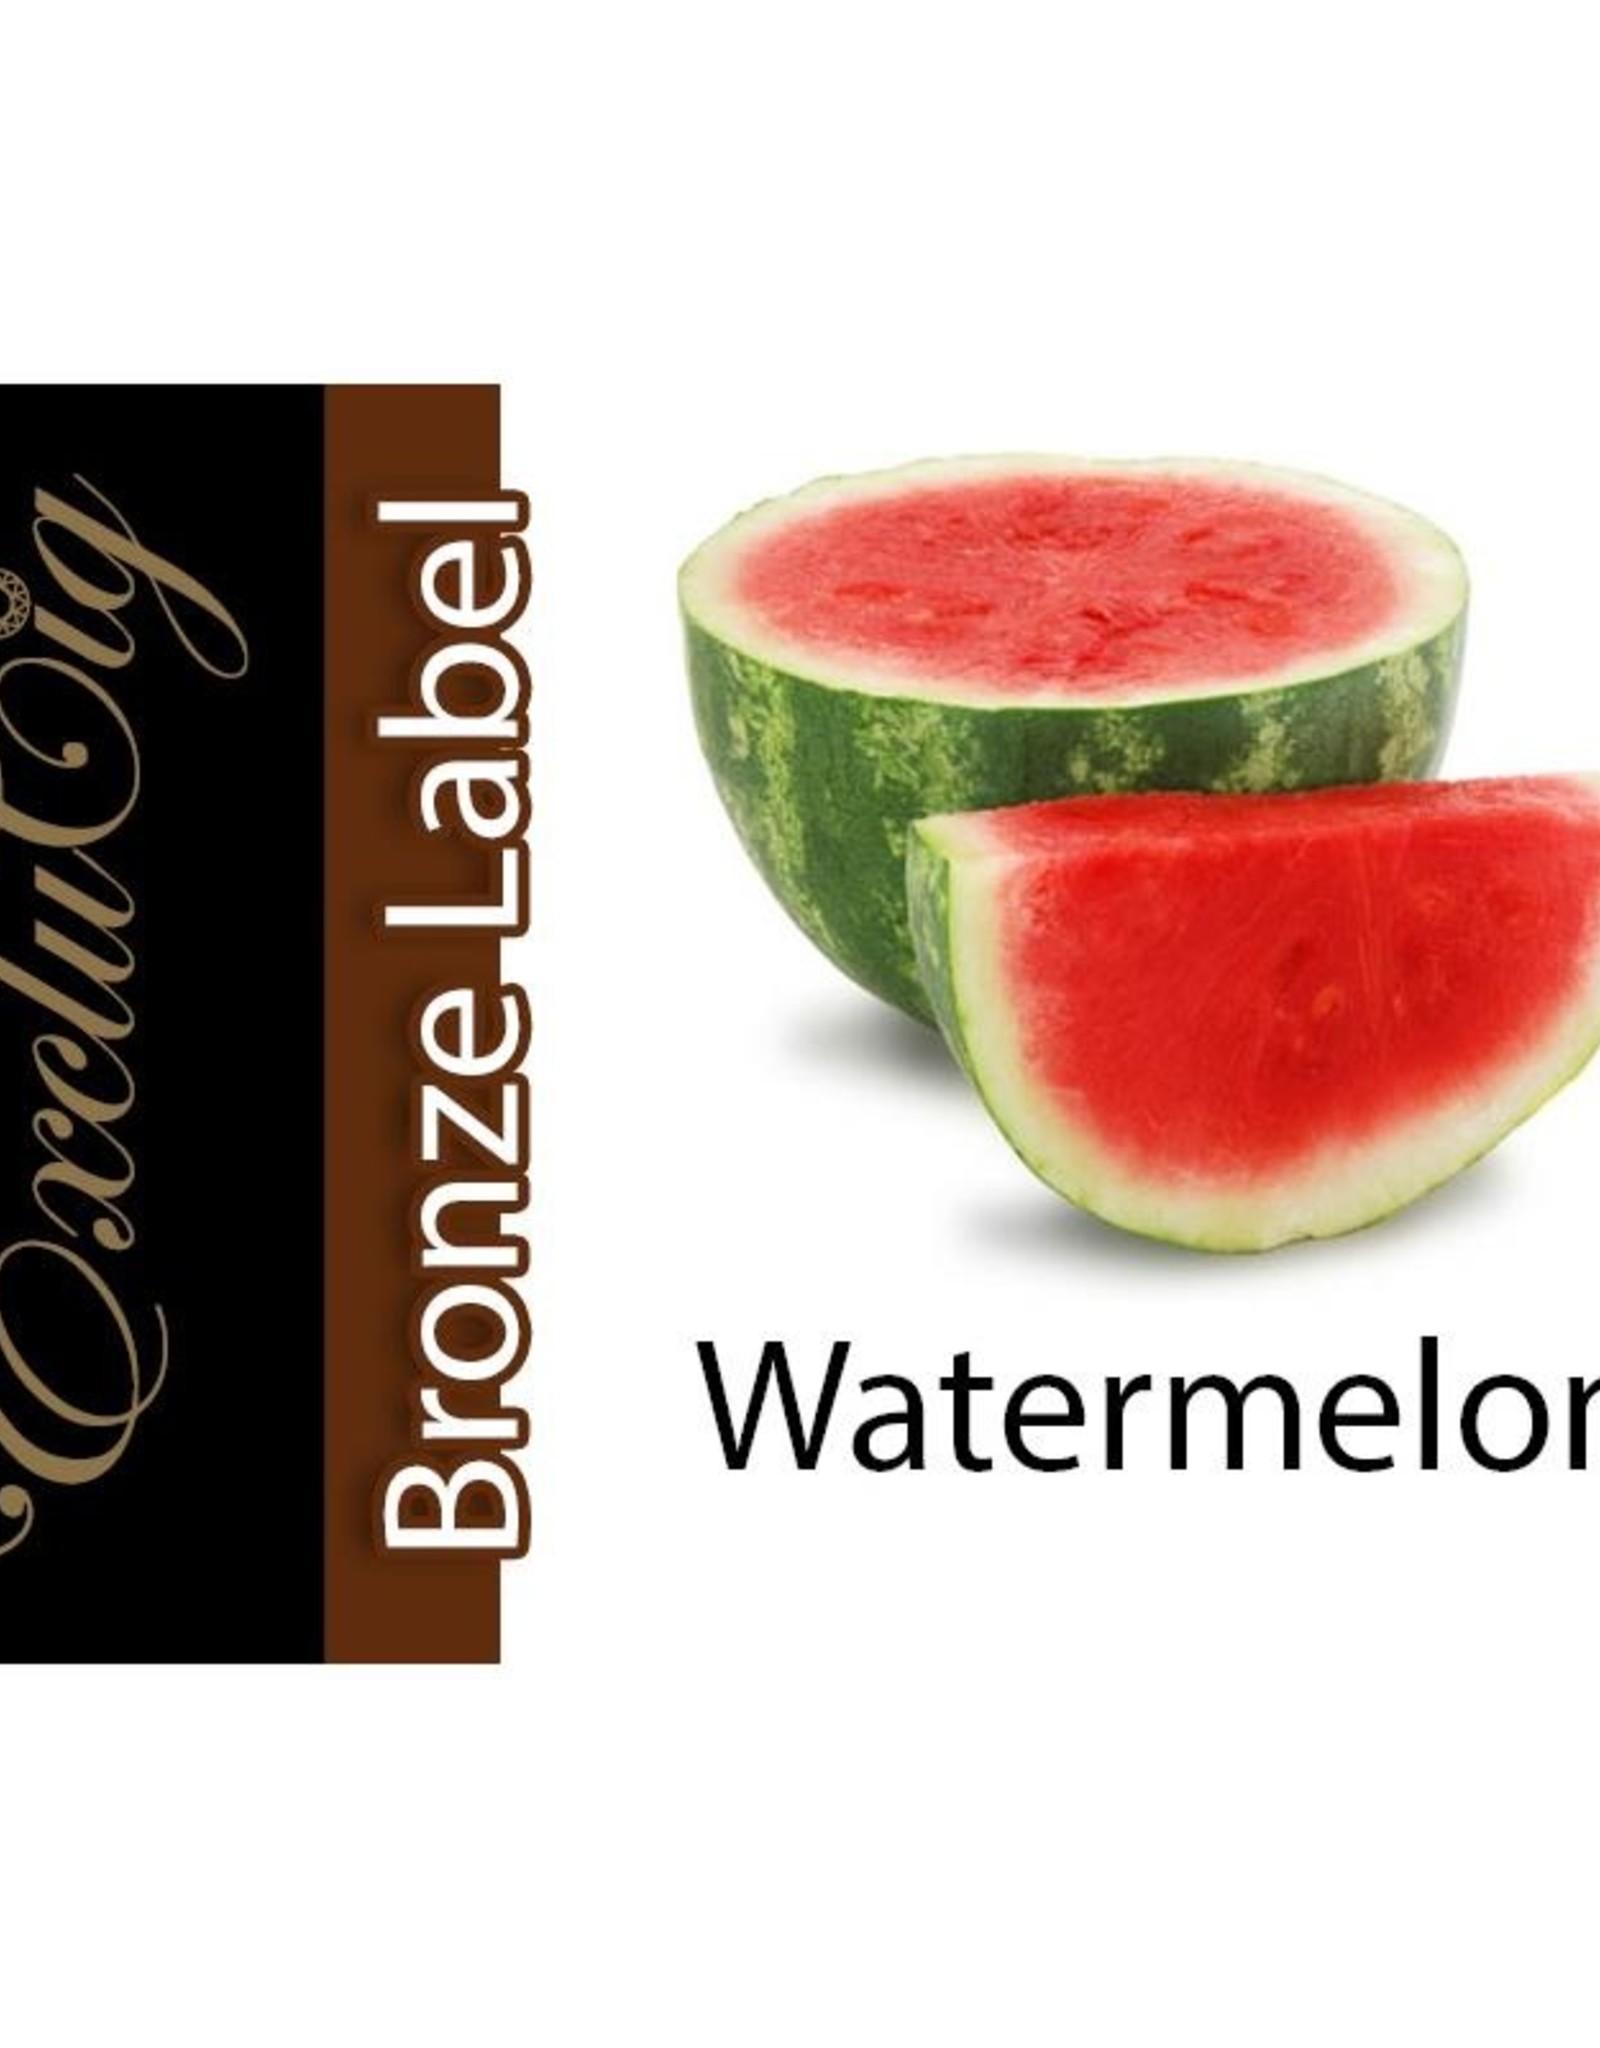 Exclucig Exclucig Bronze Label E-liquid Watermelon 18 mg Nicotine